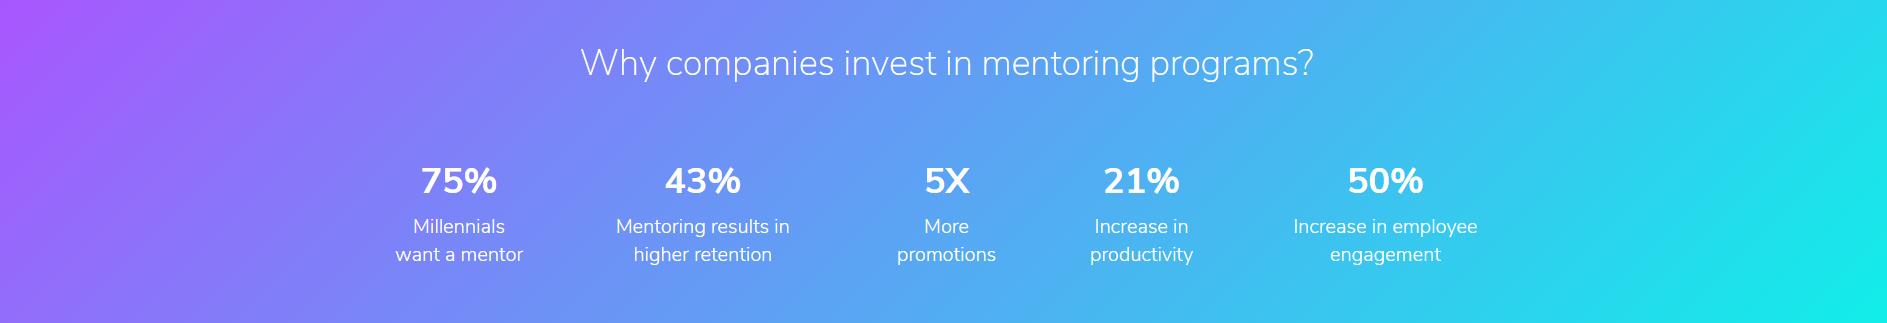 company mentoring program